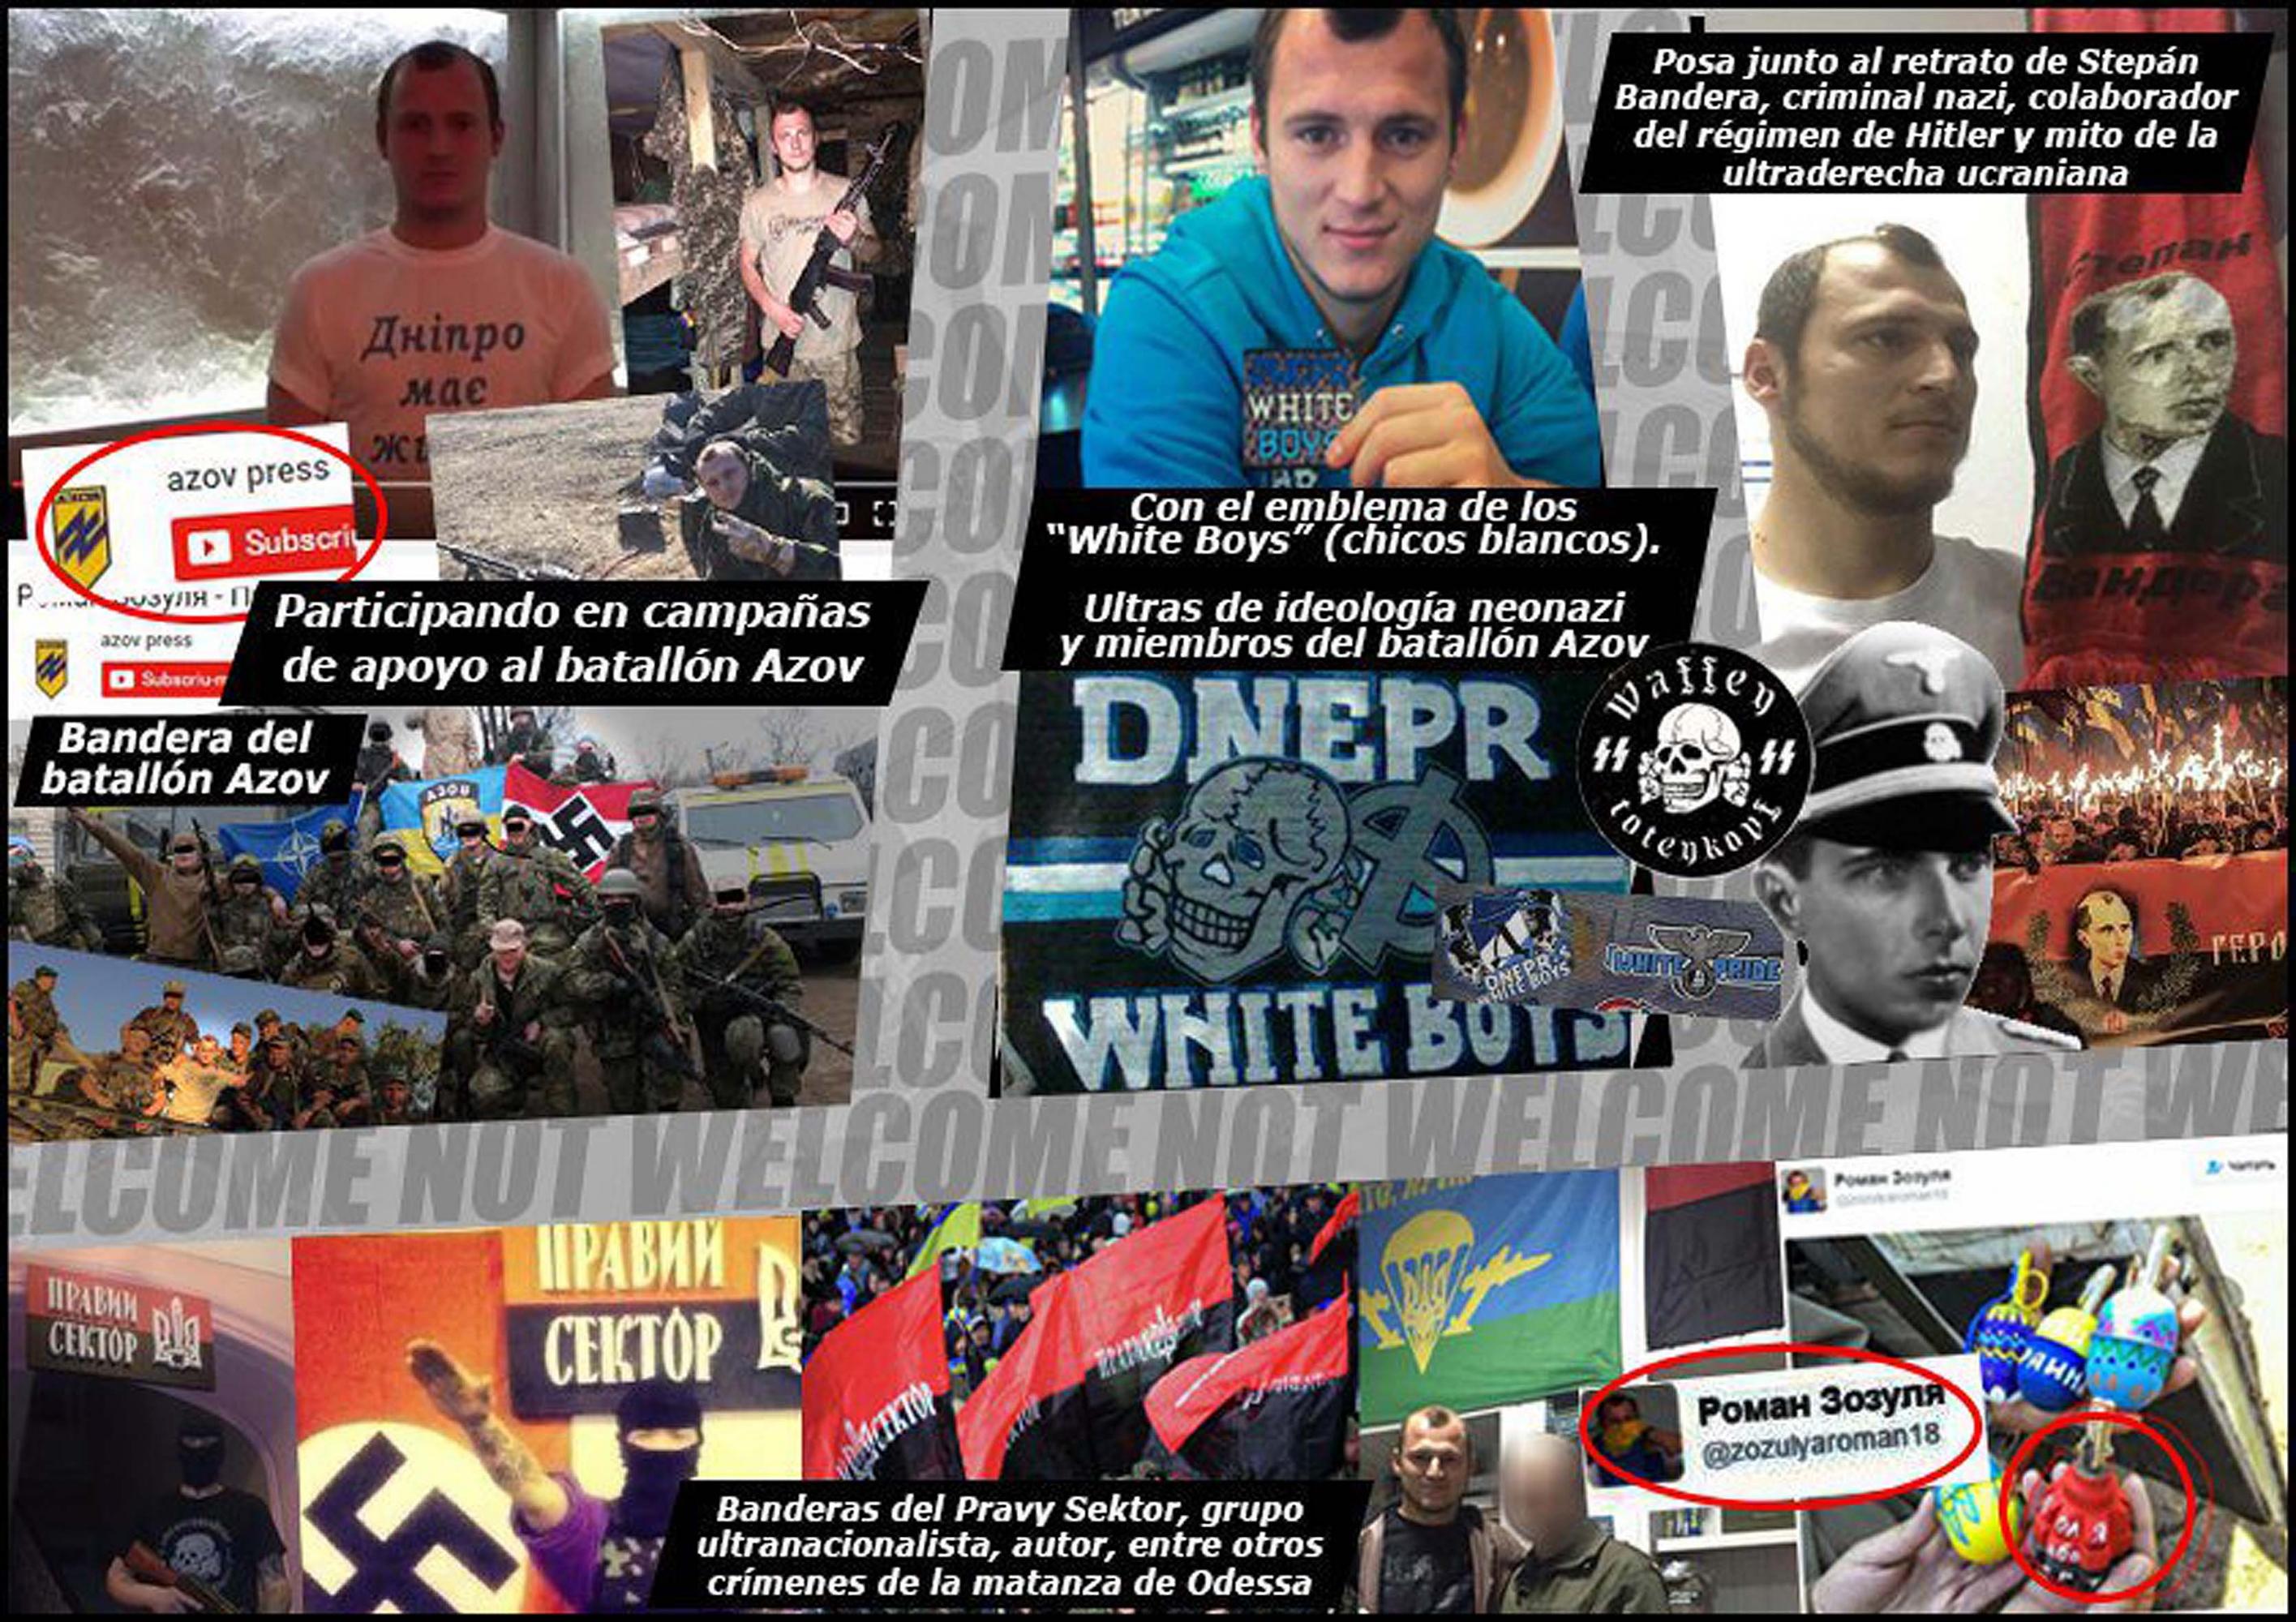 ¿Ascenso del fascismo? - Página 7 59fcc75ed4bb2